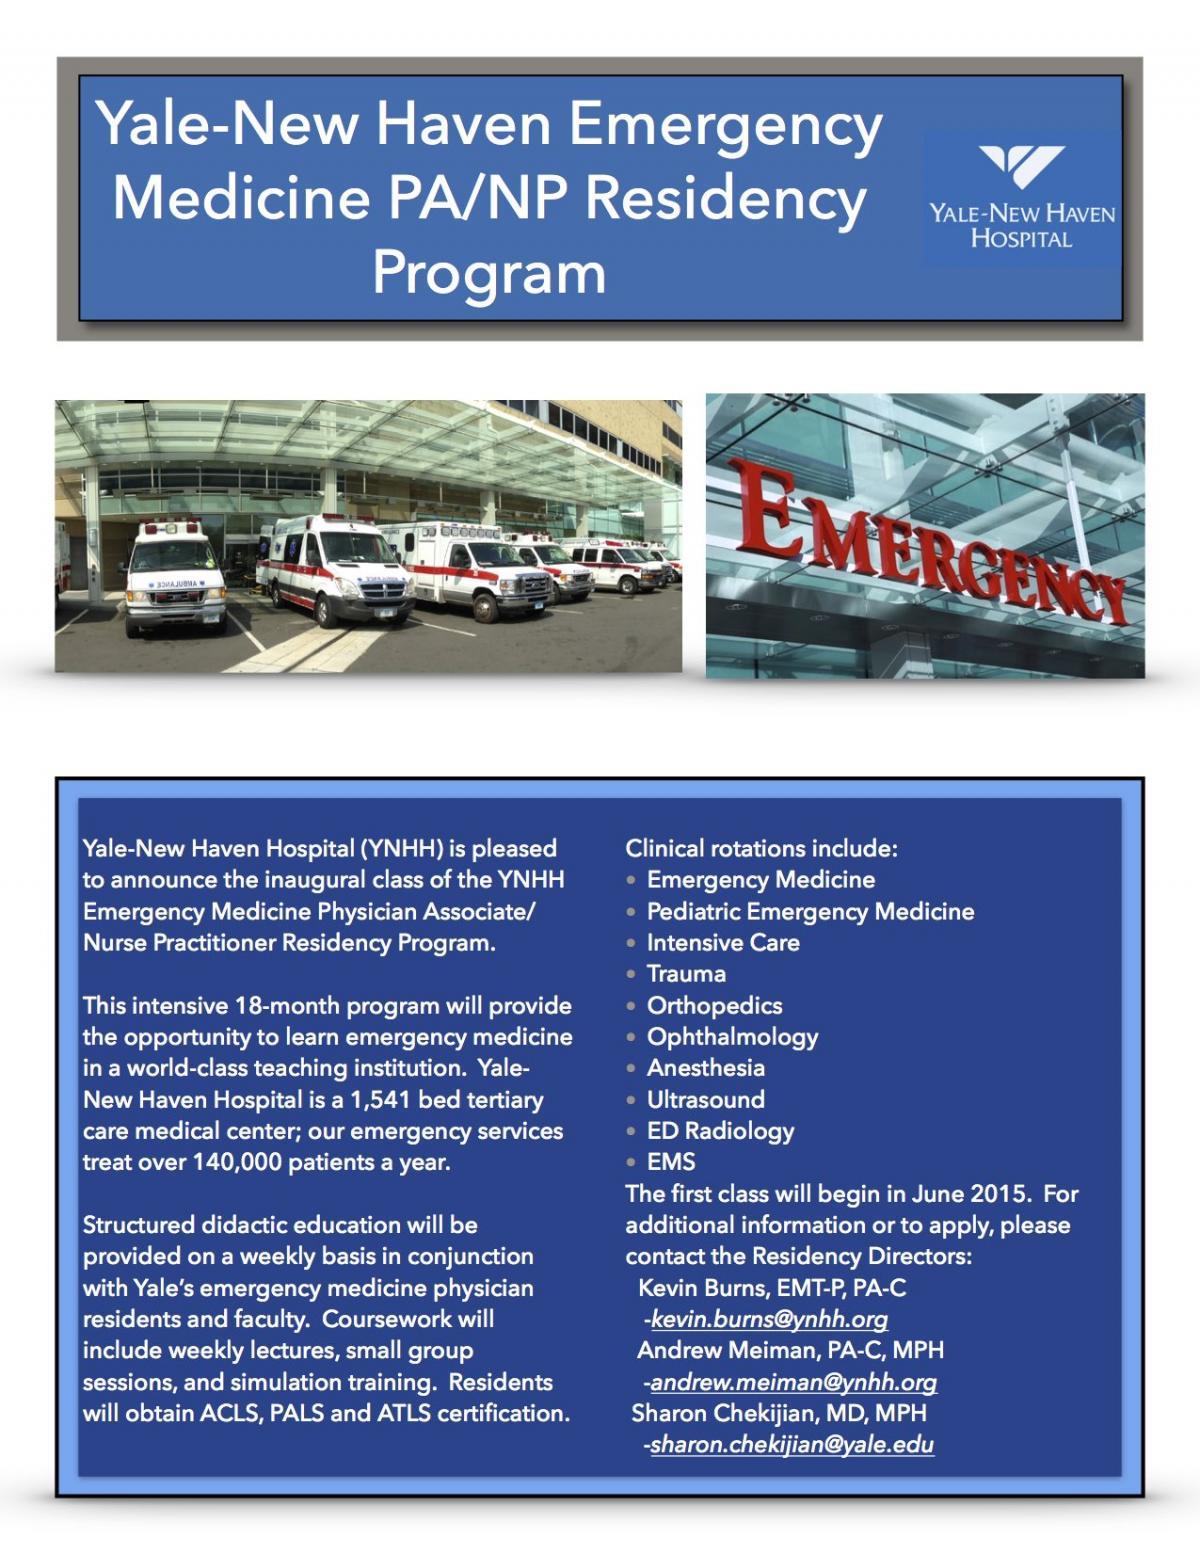 Yale-New Haven Hospital Emergency Medicine Residency